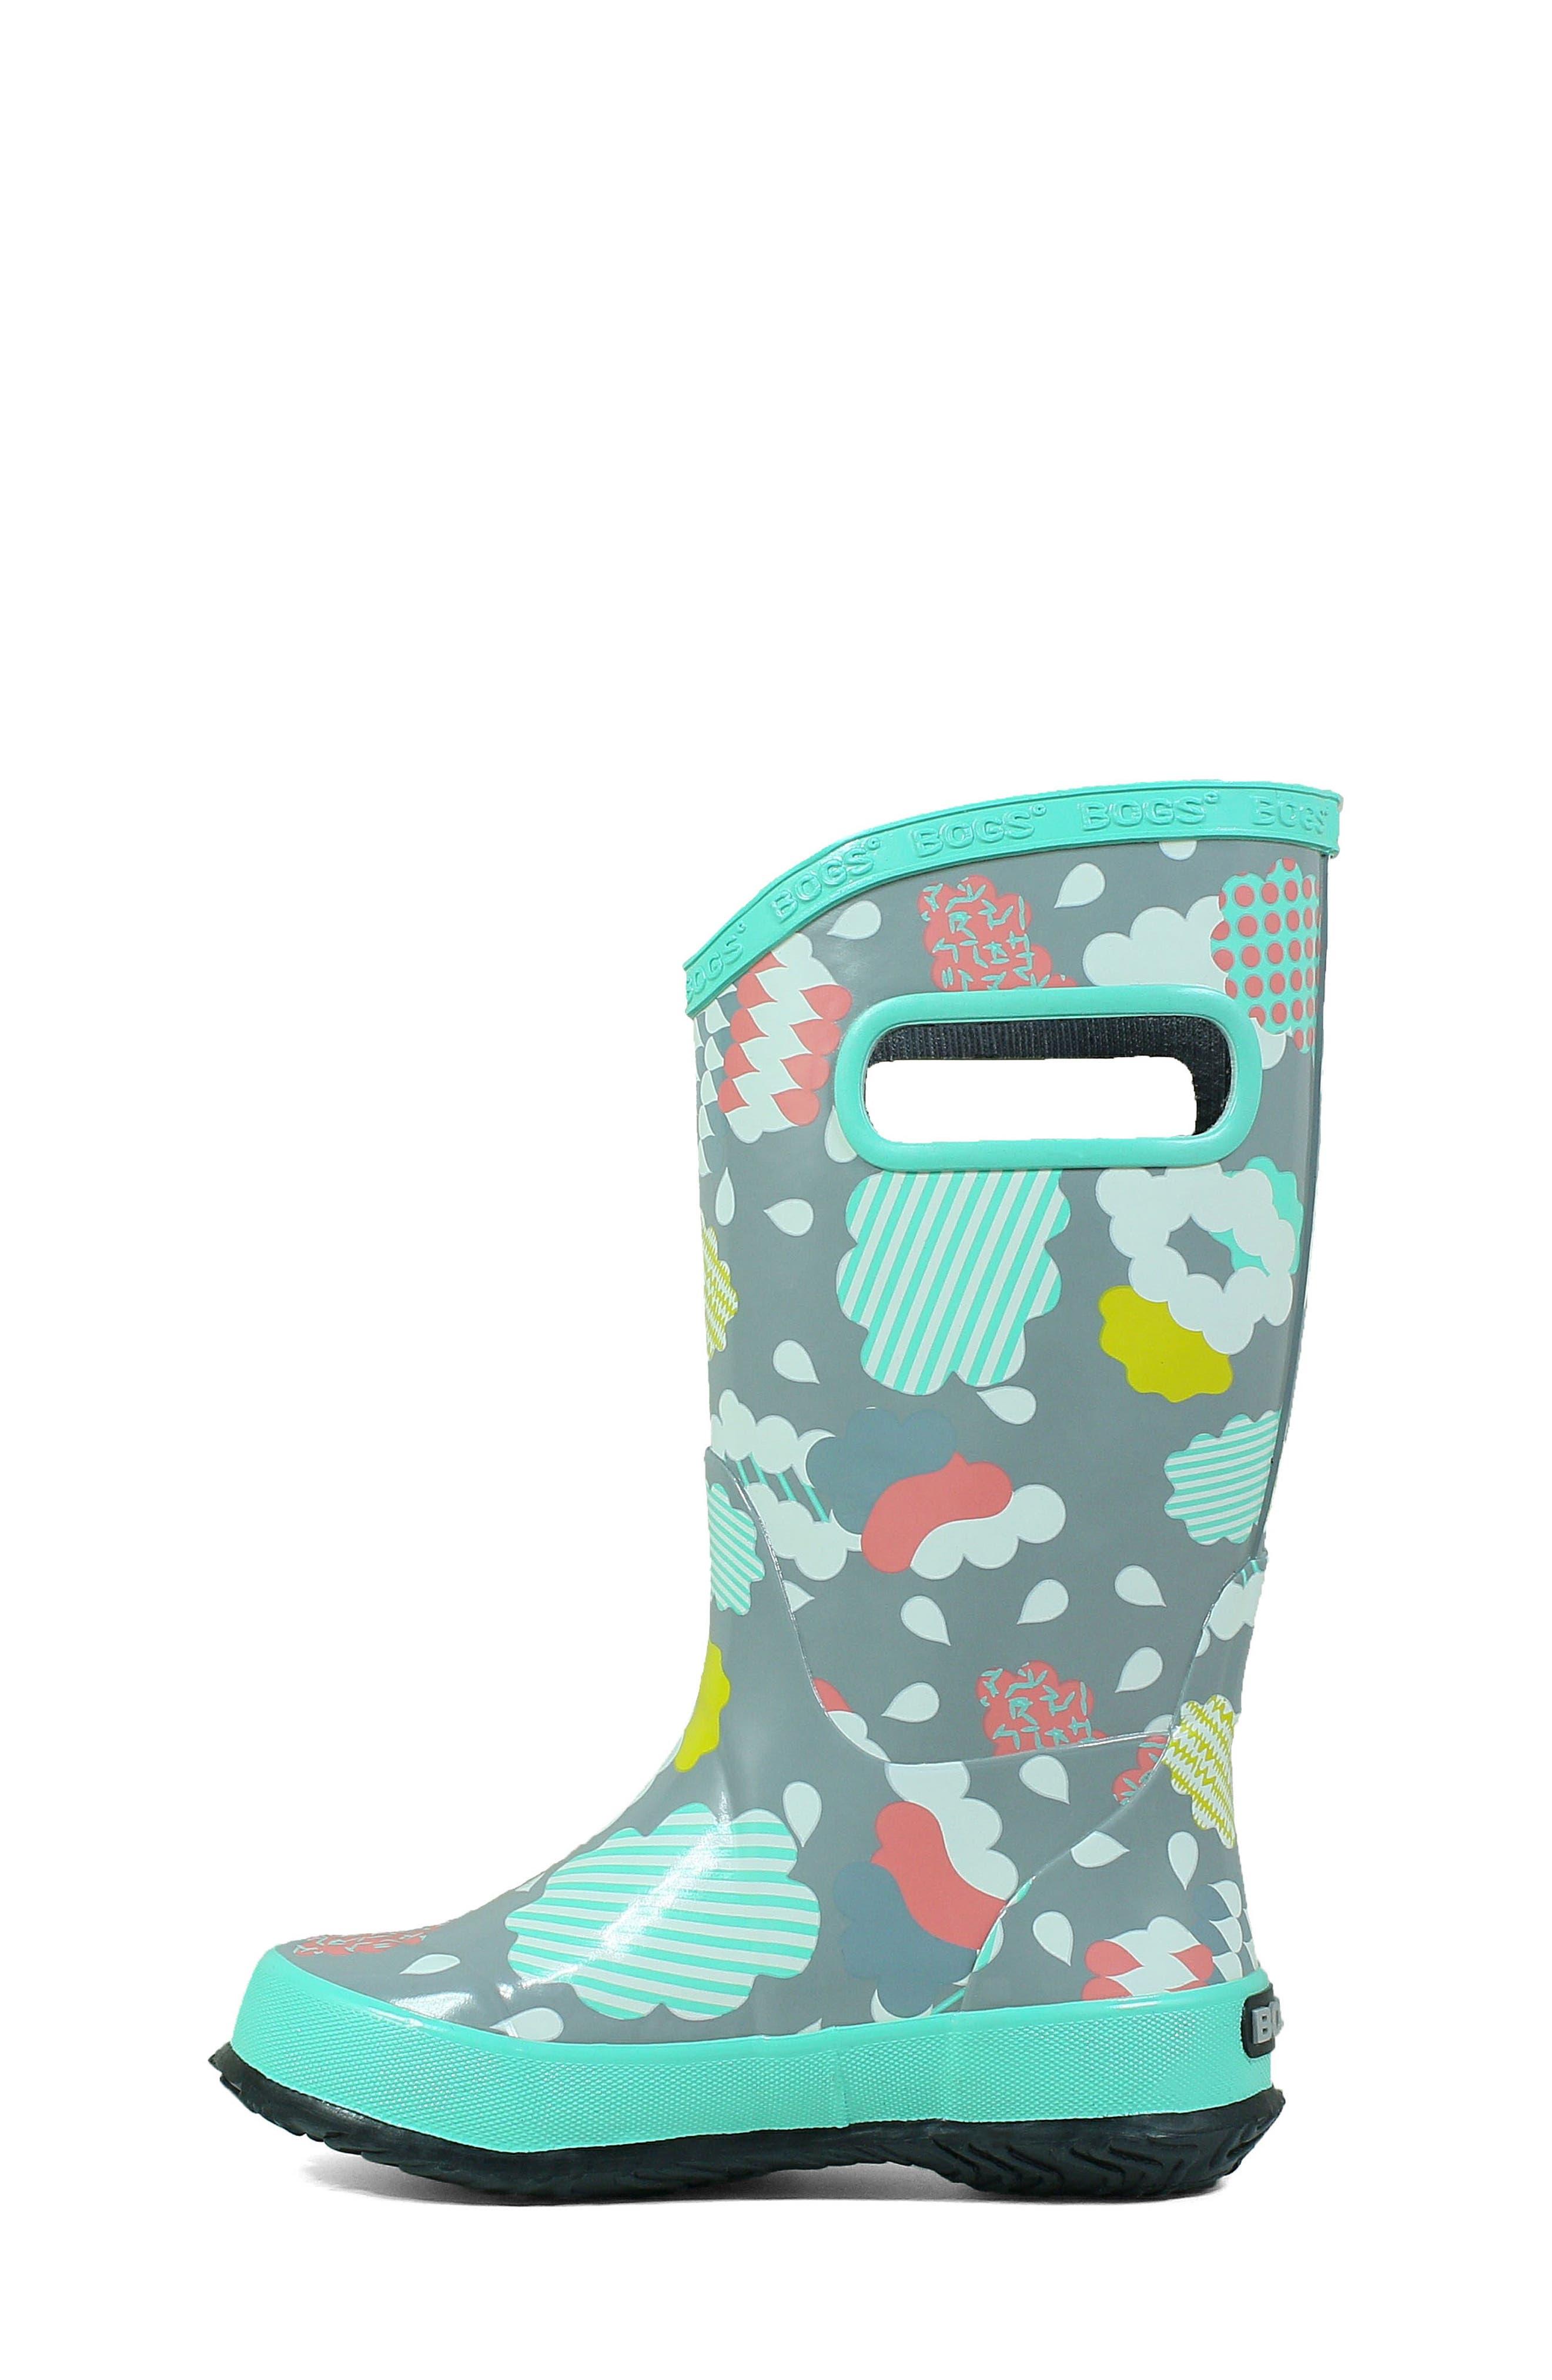 BOGS, Clouds Waterproof Rain Boot, Alternate thumbnail 8, color, 062